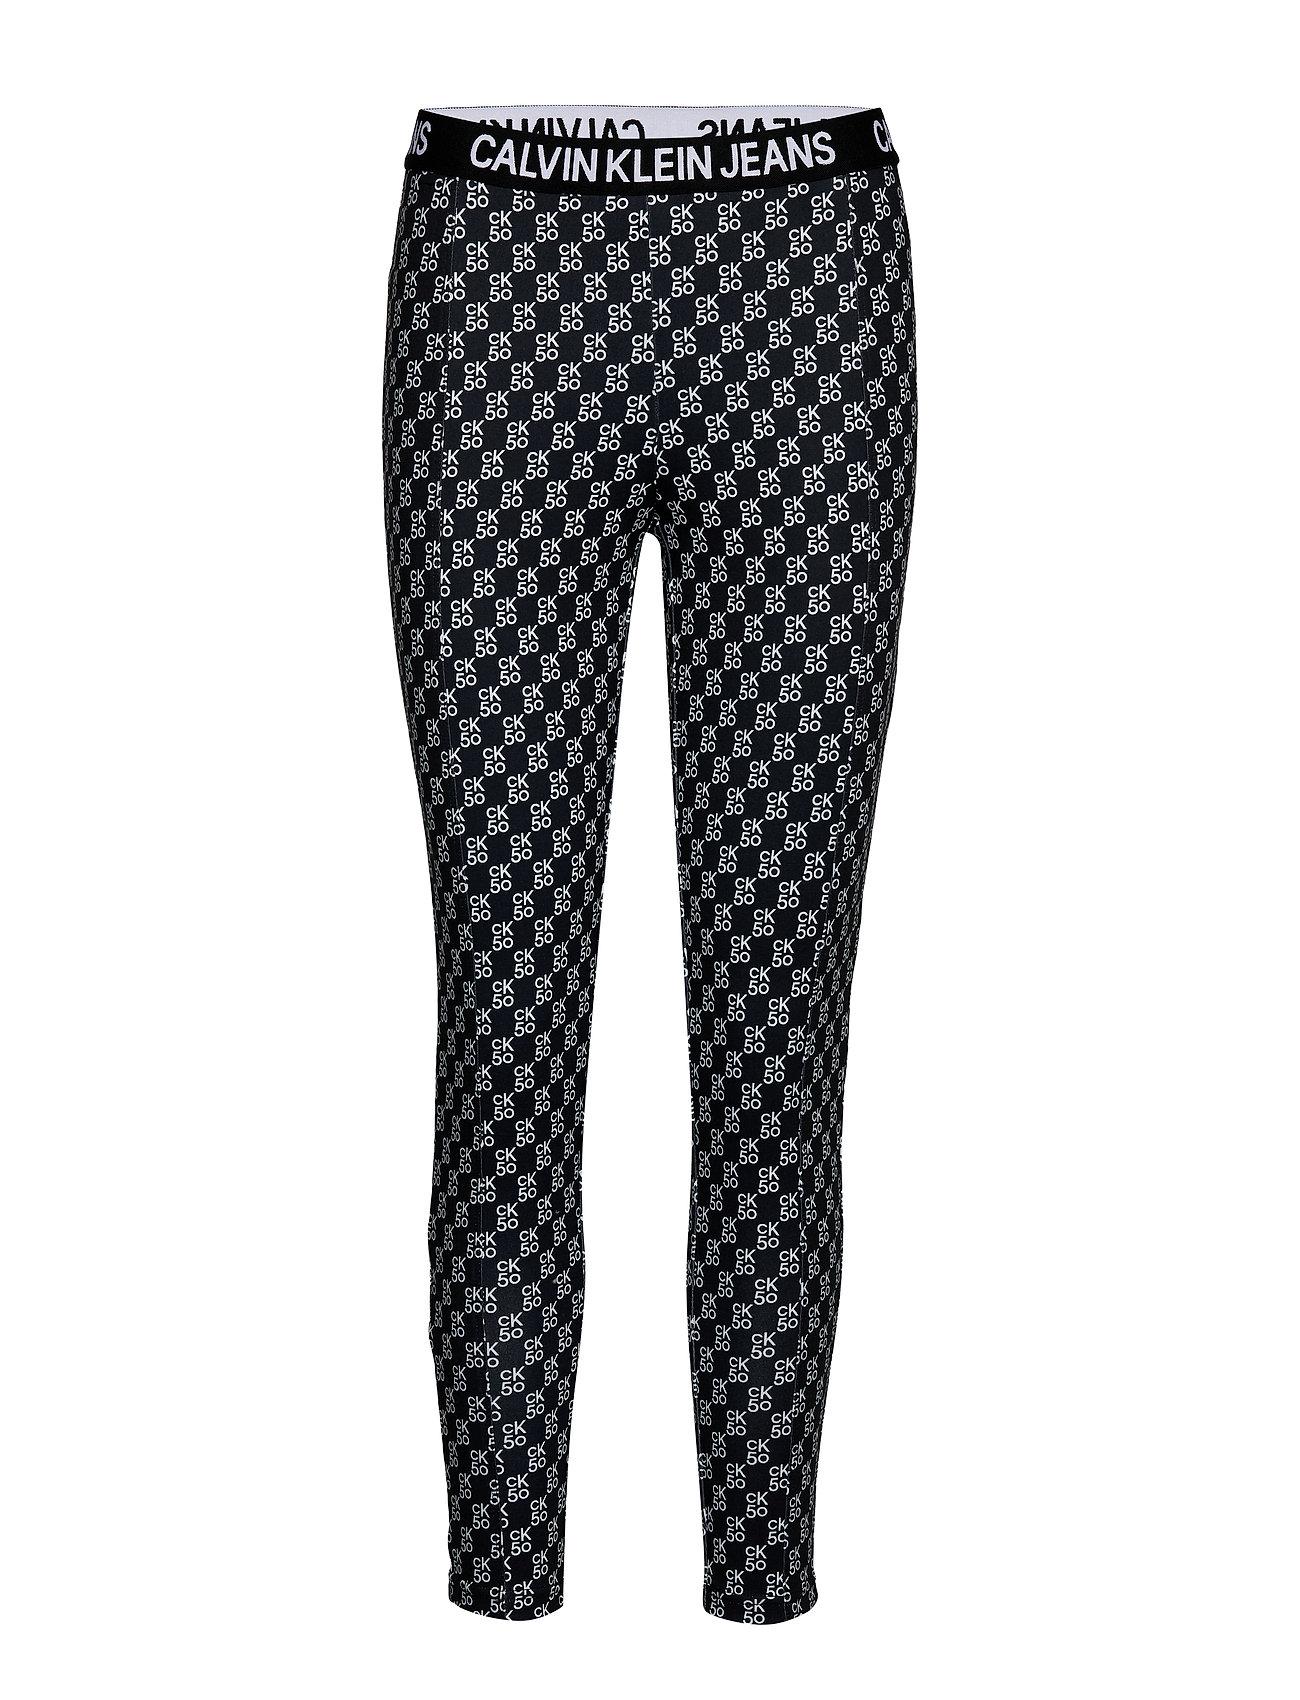 Calvin Klein Jeans AOP MILANO LEGGINGS - CK50 AOP BLACK/ WHITE LOGO